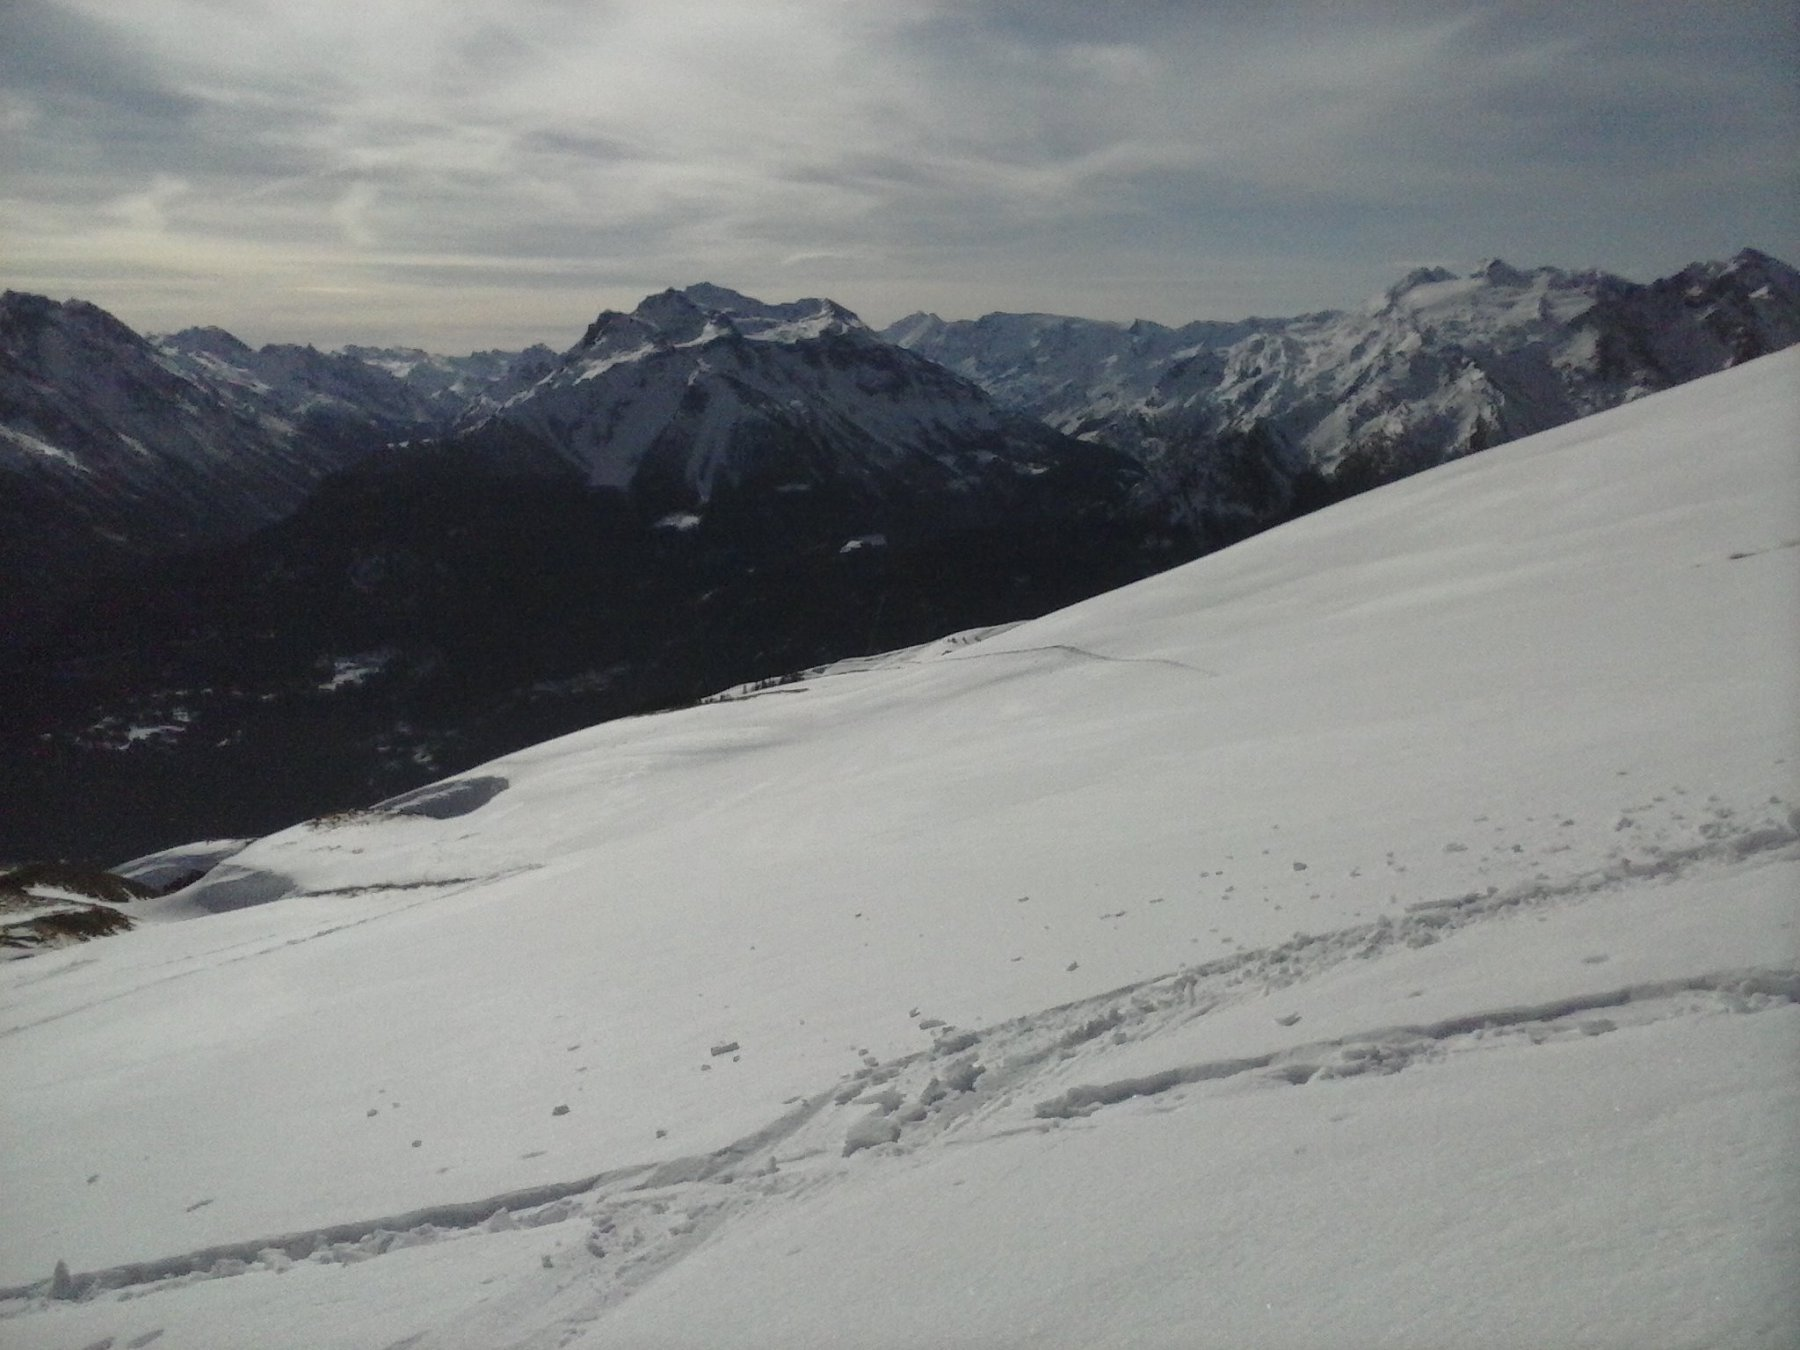 versante di discesa  ampio  con neve intonsa...